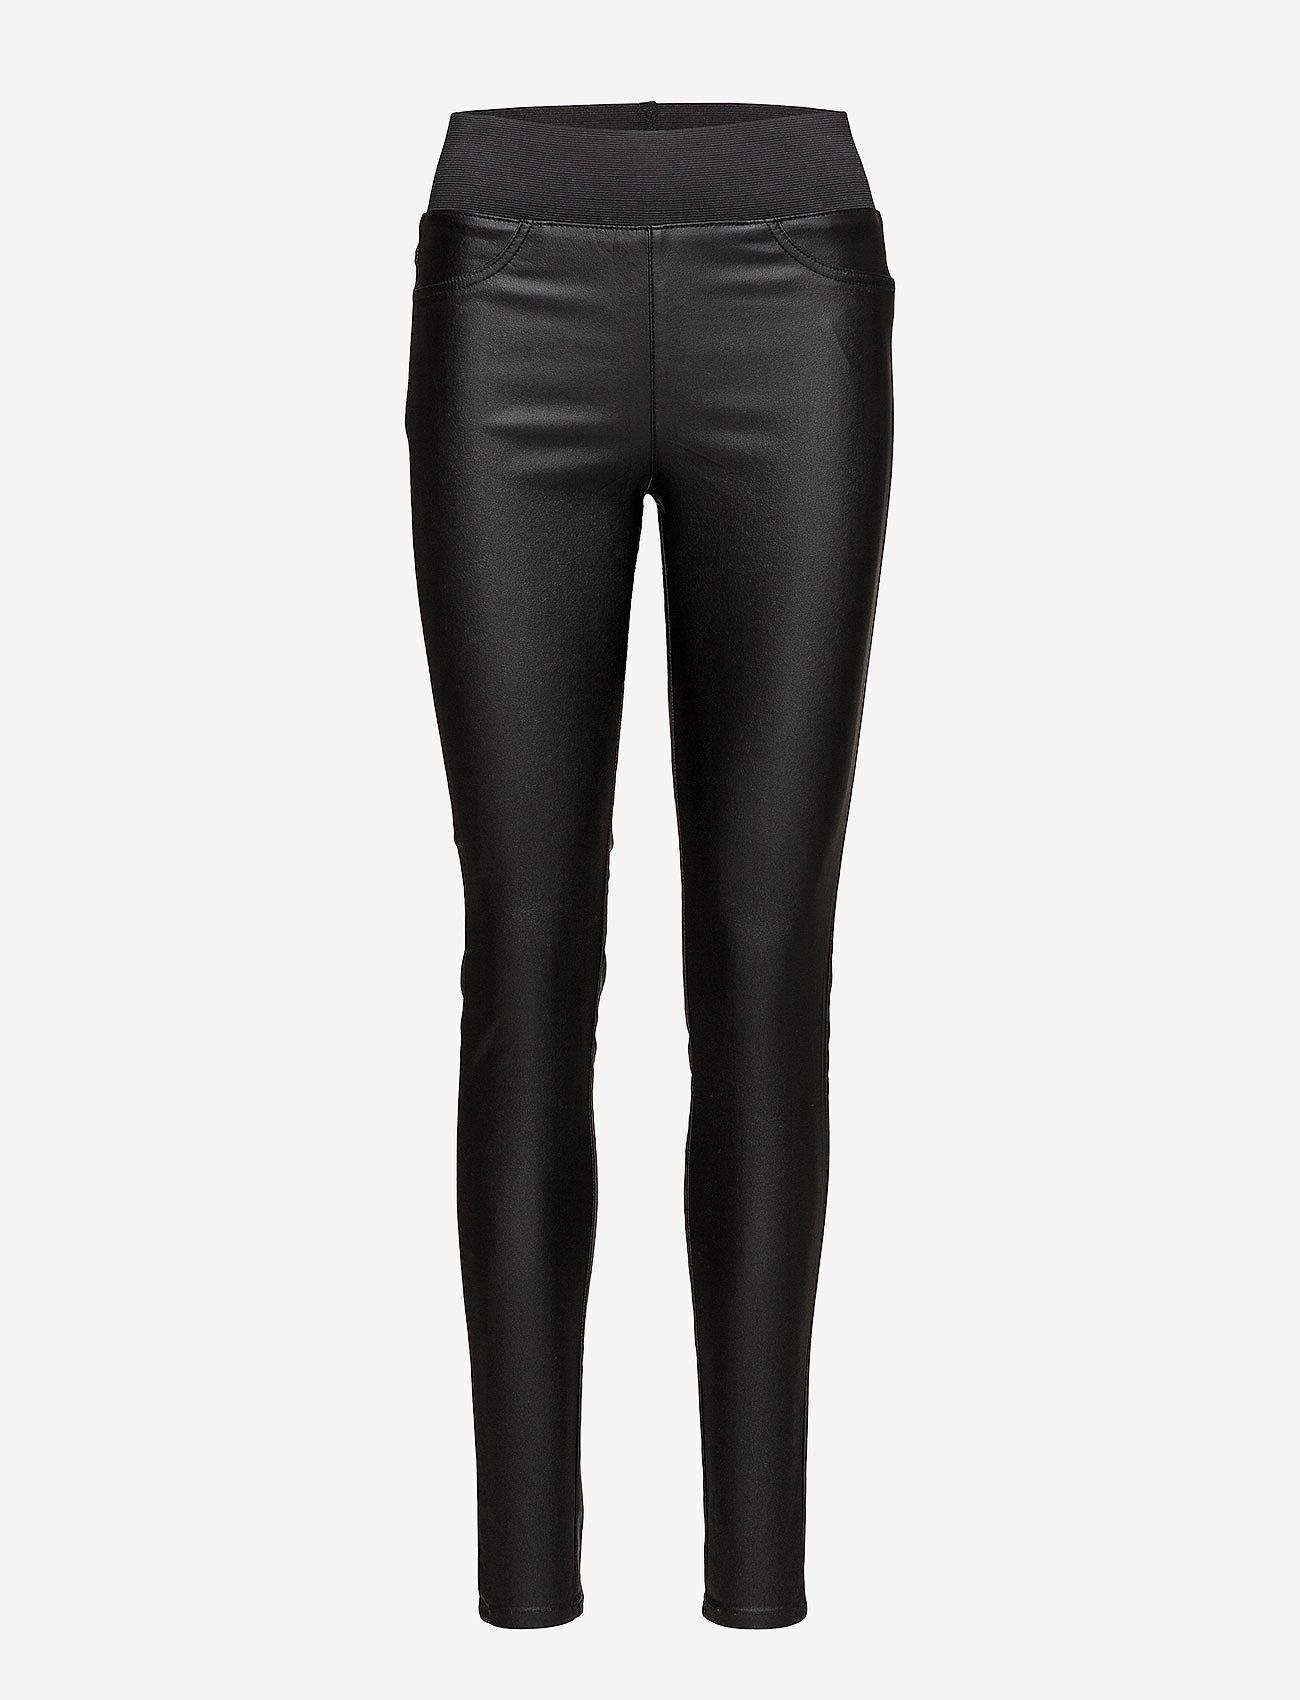 FREE/QUENT - SHANTAL-PA-COOPER - broeken med skinny fit - black - 0